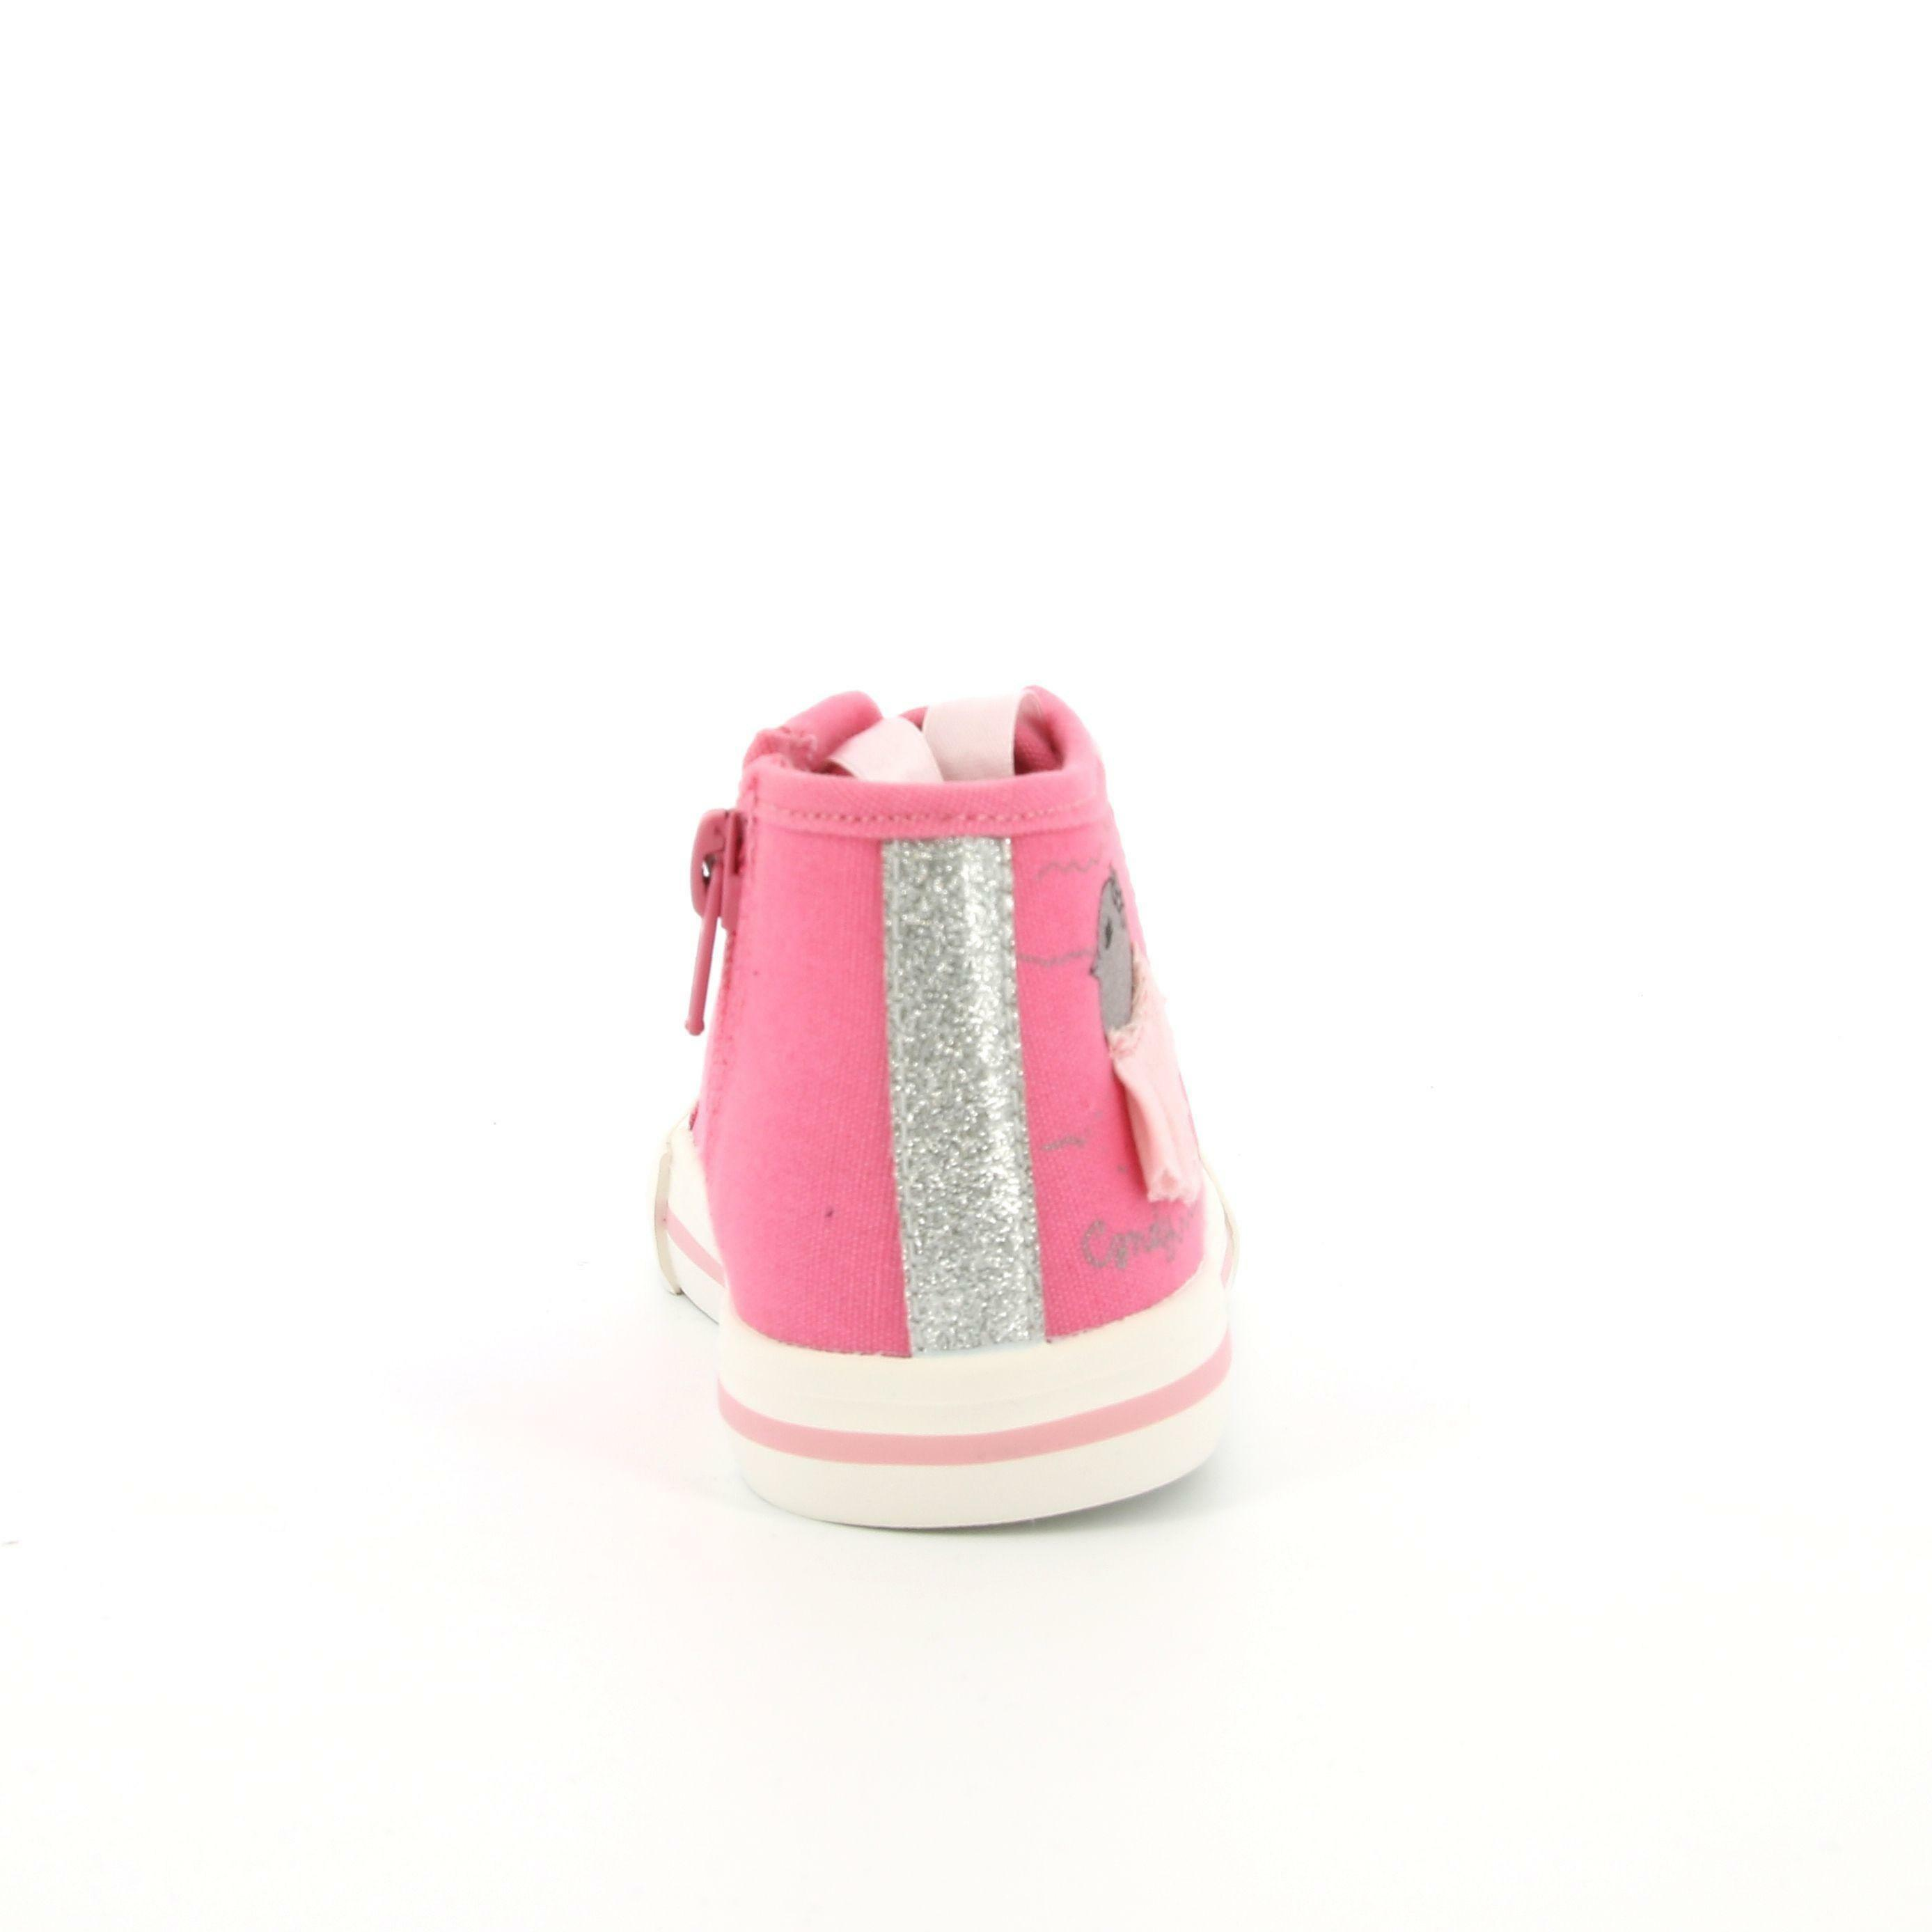 chicco chicco sneakers polacchino caraibi 63573-23-23 fuxia